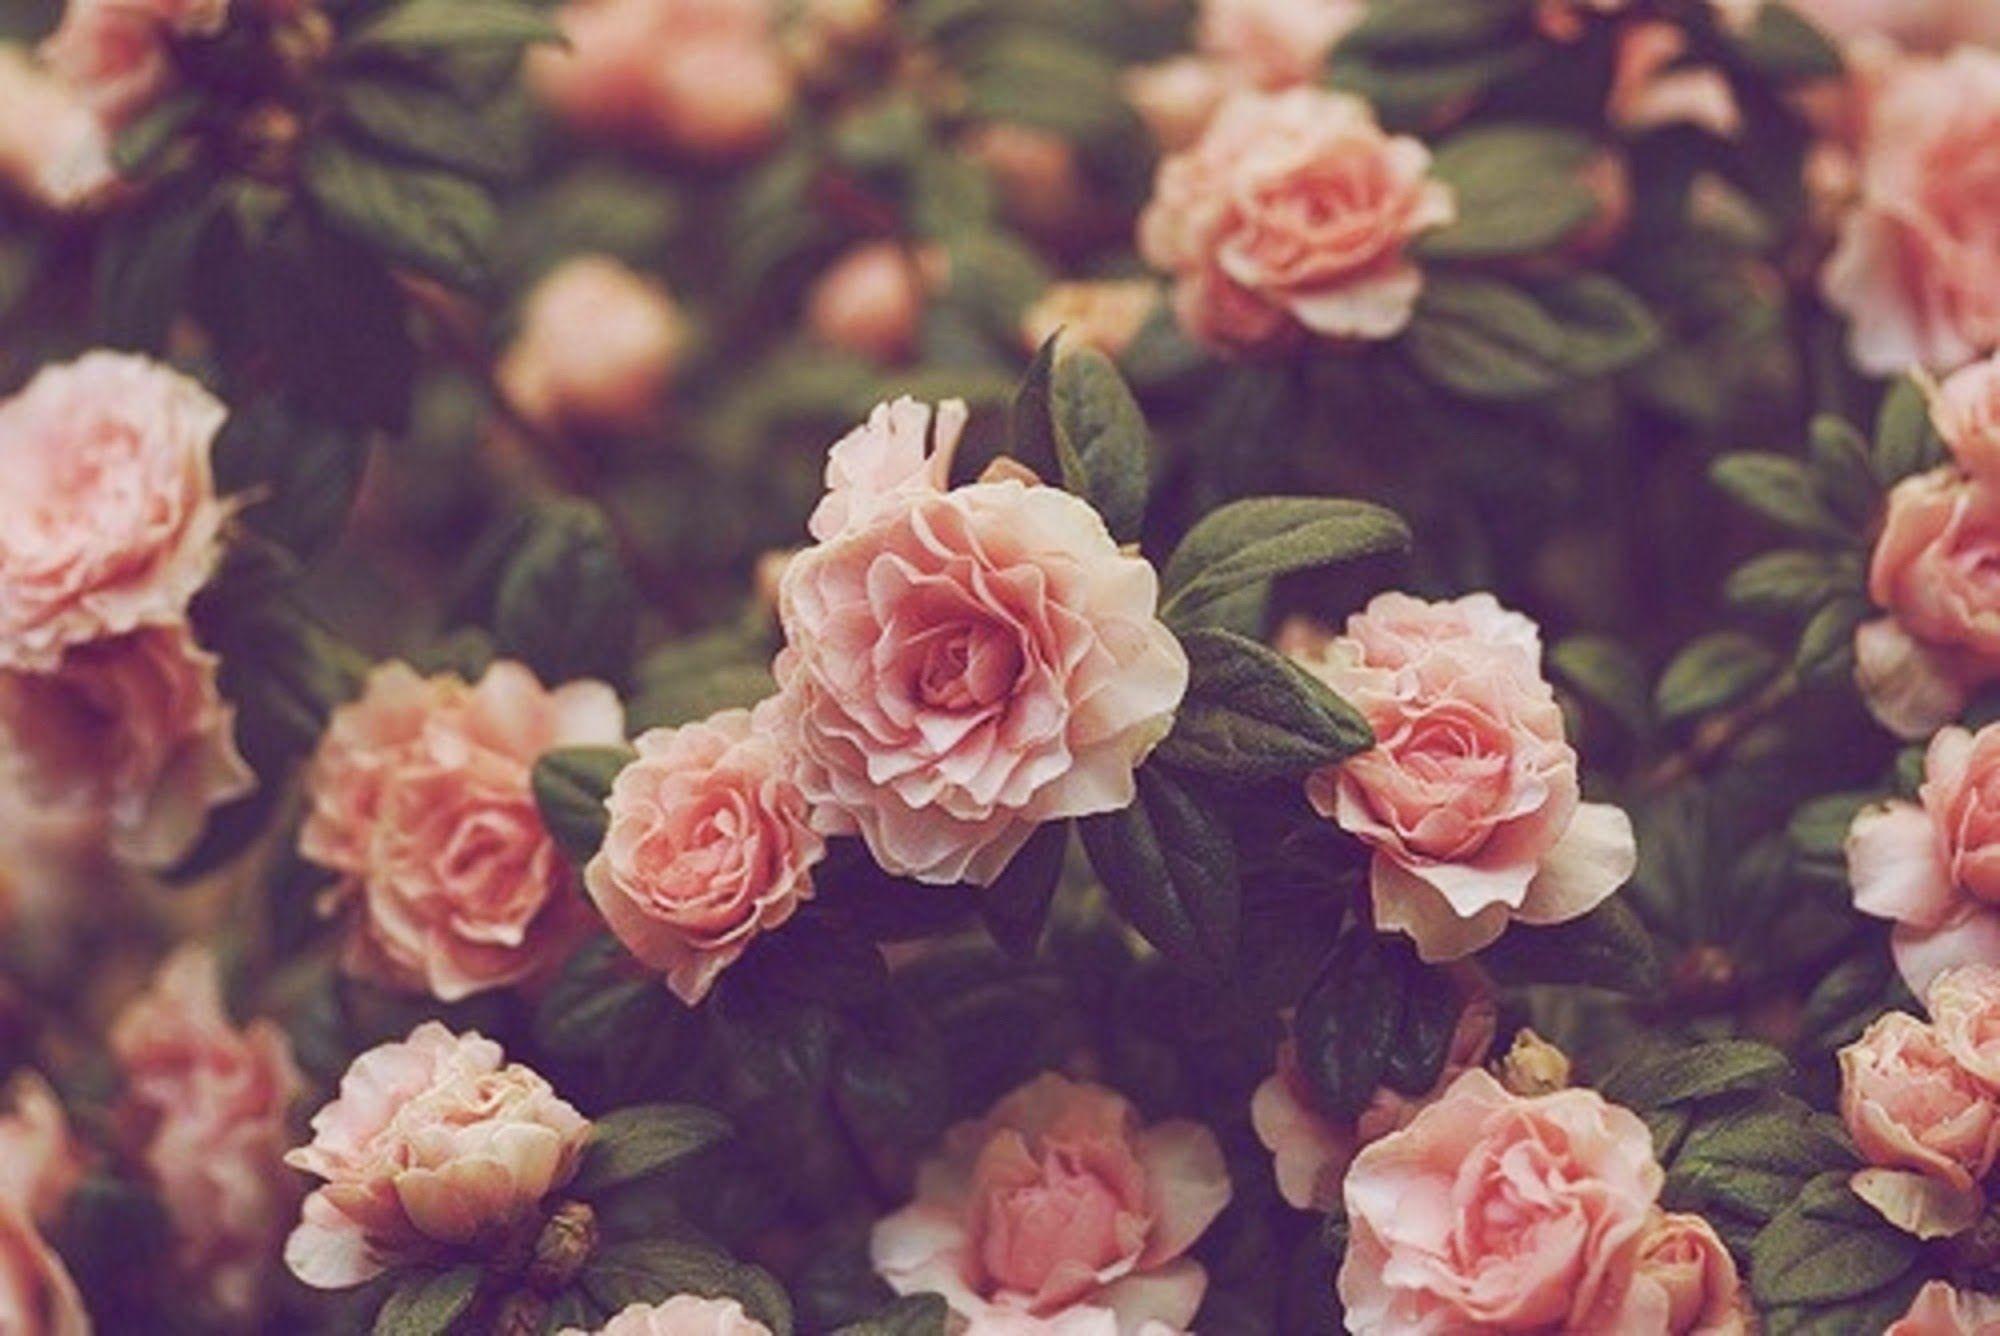 Vintage Flower Tumblr Wallpapers High Resolution On Wallpaper 1080p Hd Vintage Flowers Wallpaper Vintage Flower Backgrounds Flower Backgrounds